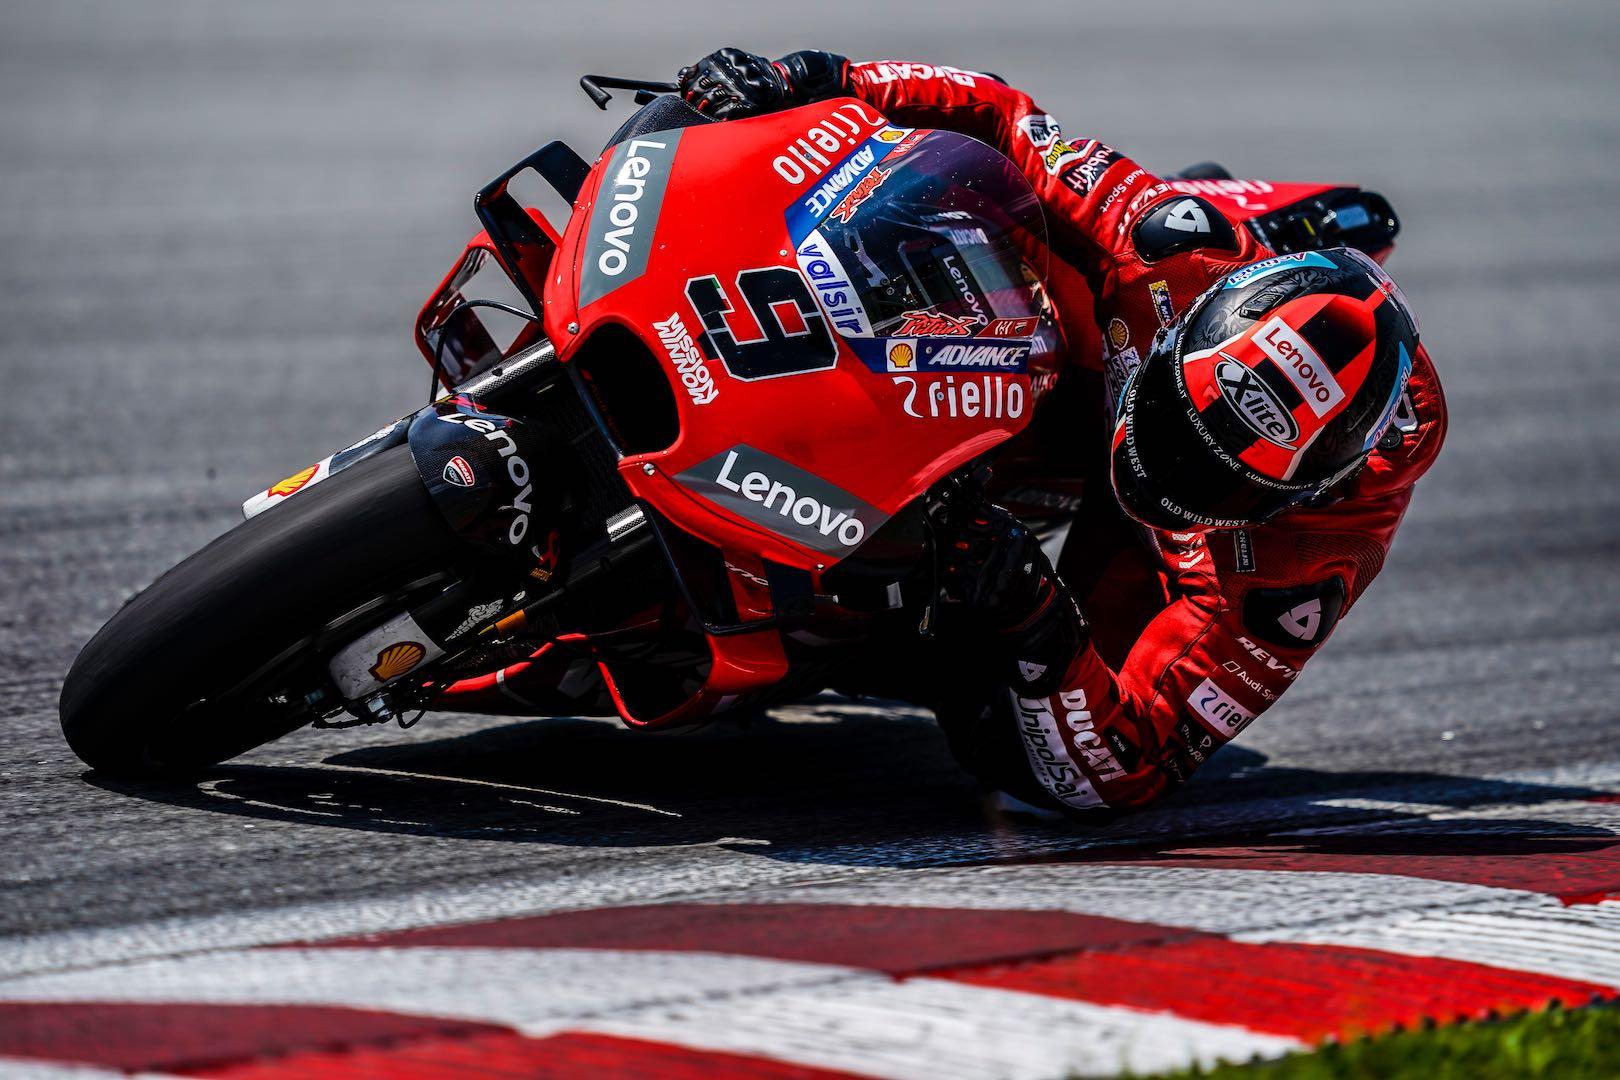 2019 Sepang MotoGP Test Results: Ducati Danilo Petrucci